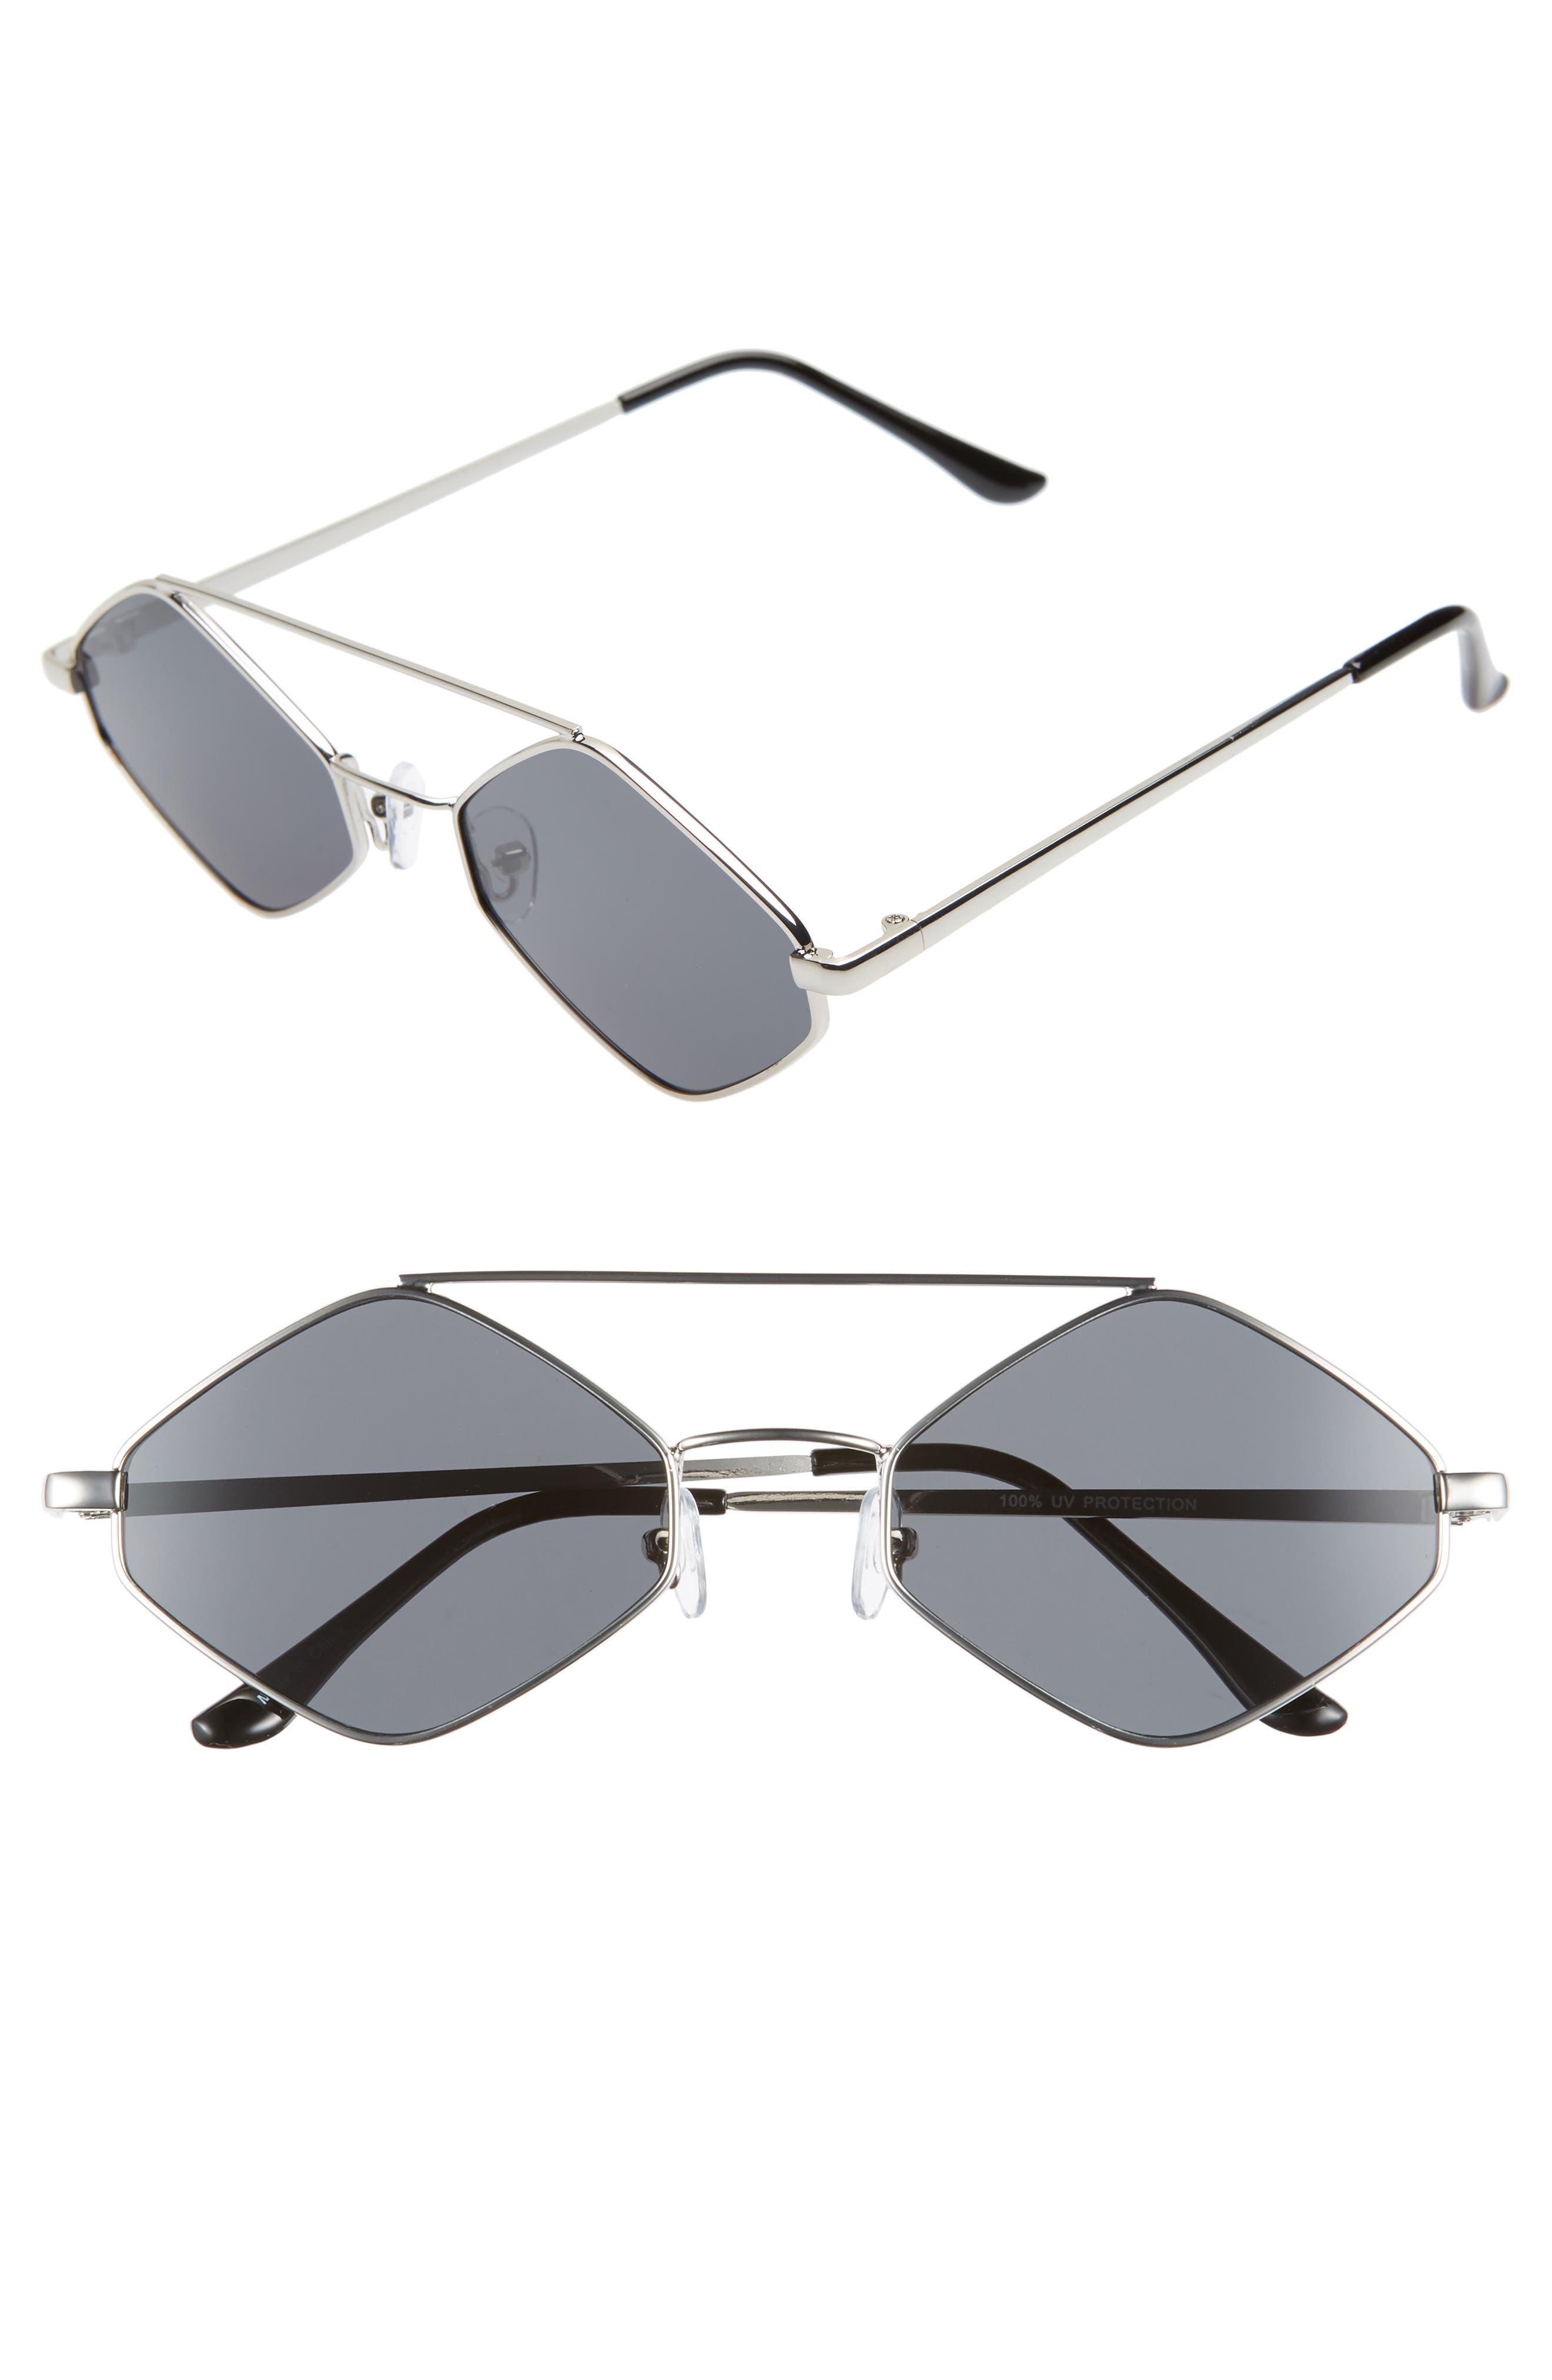 55mm Brow Bar Geometric Sunglasses,                             Main thumbnail 1, color,                             040